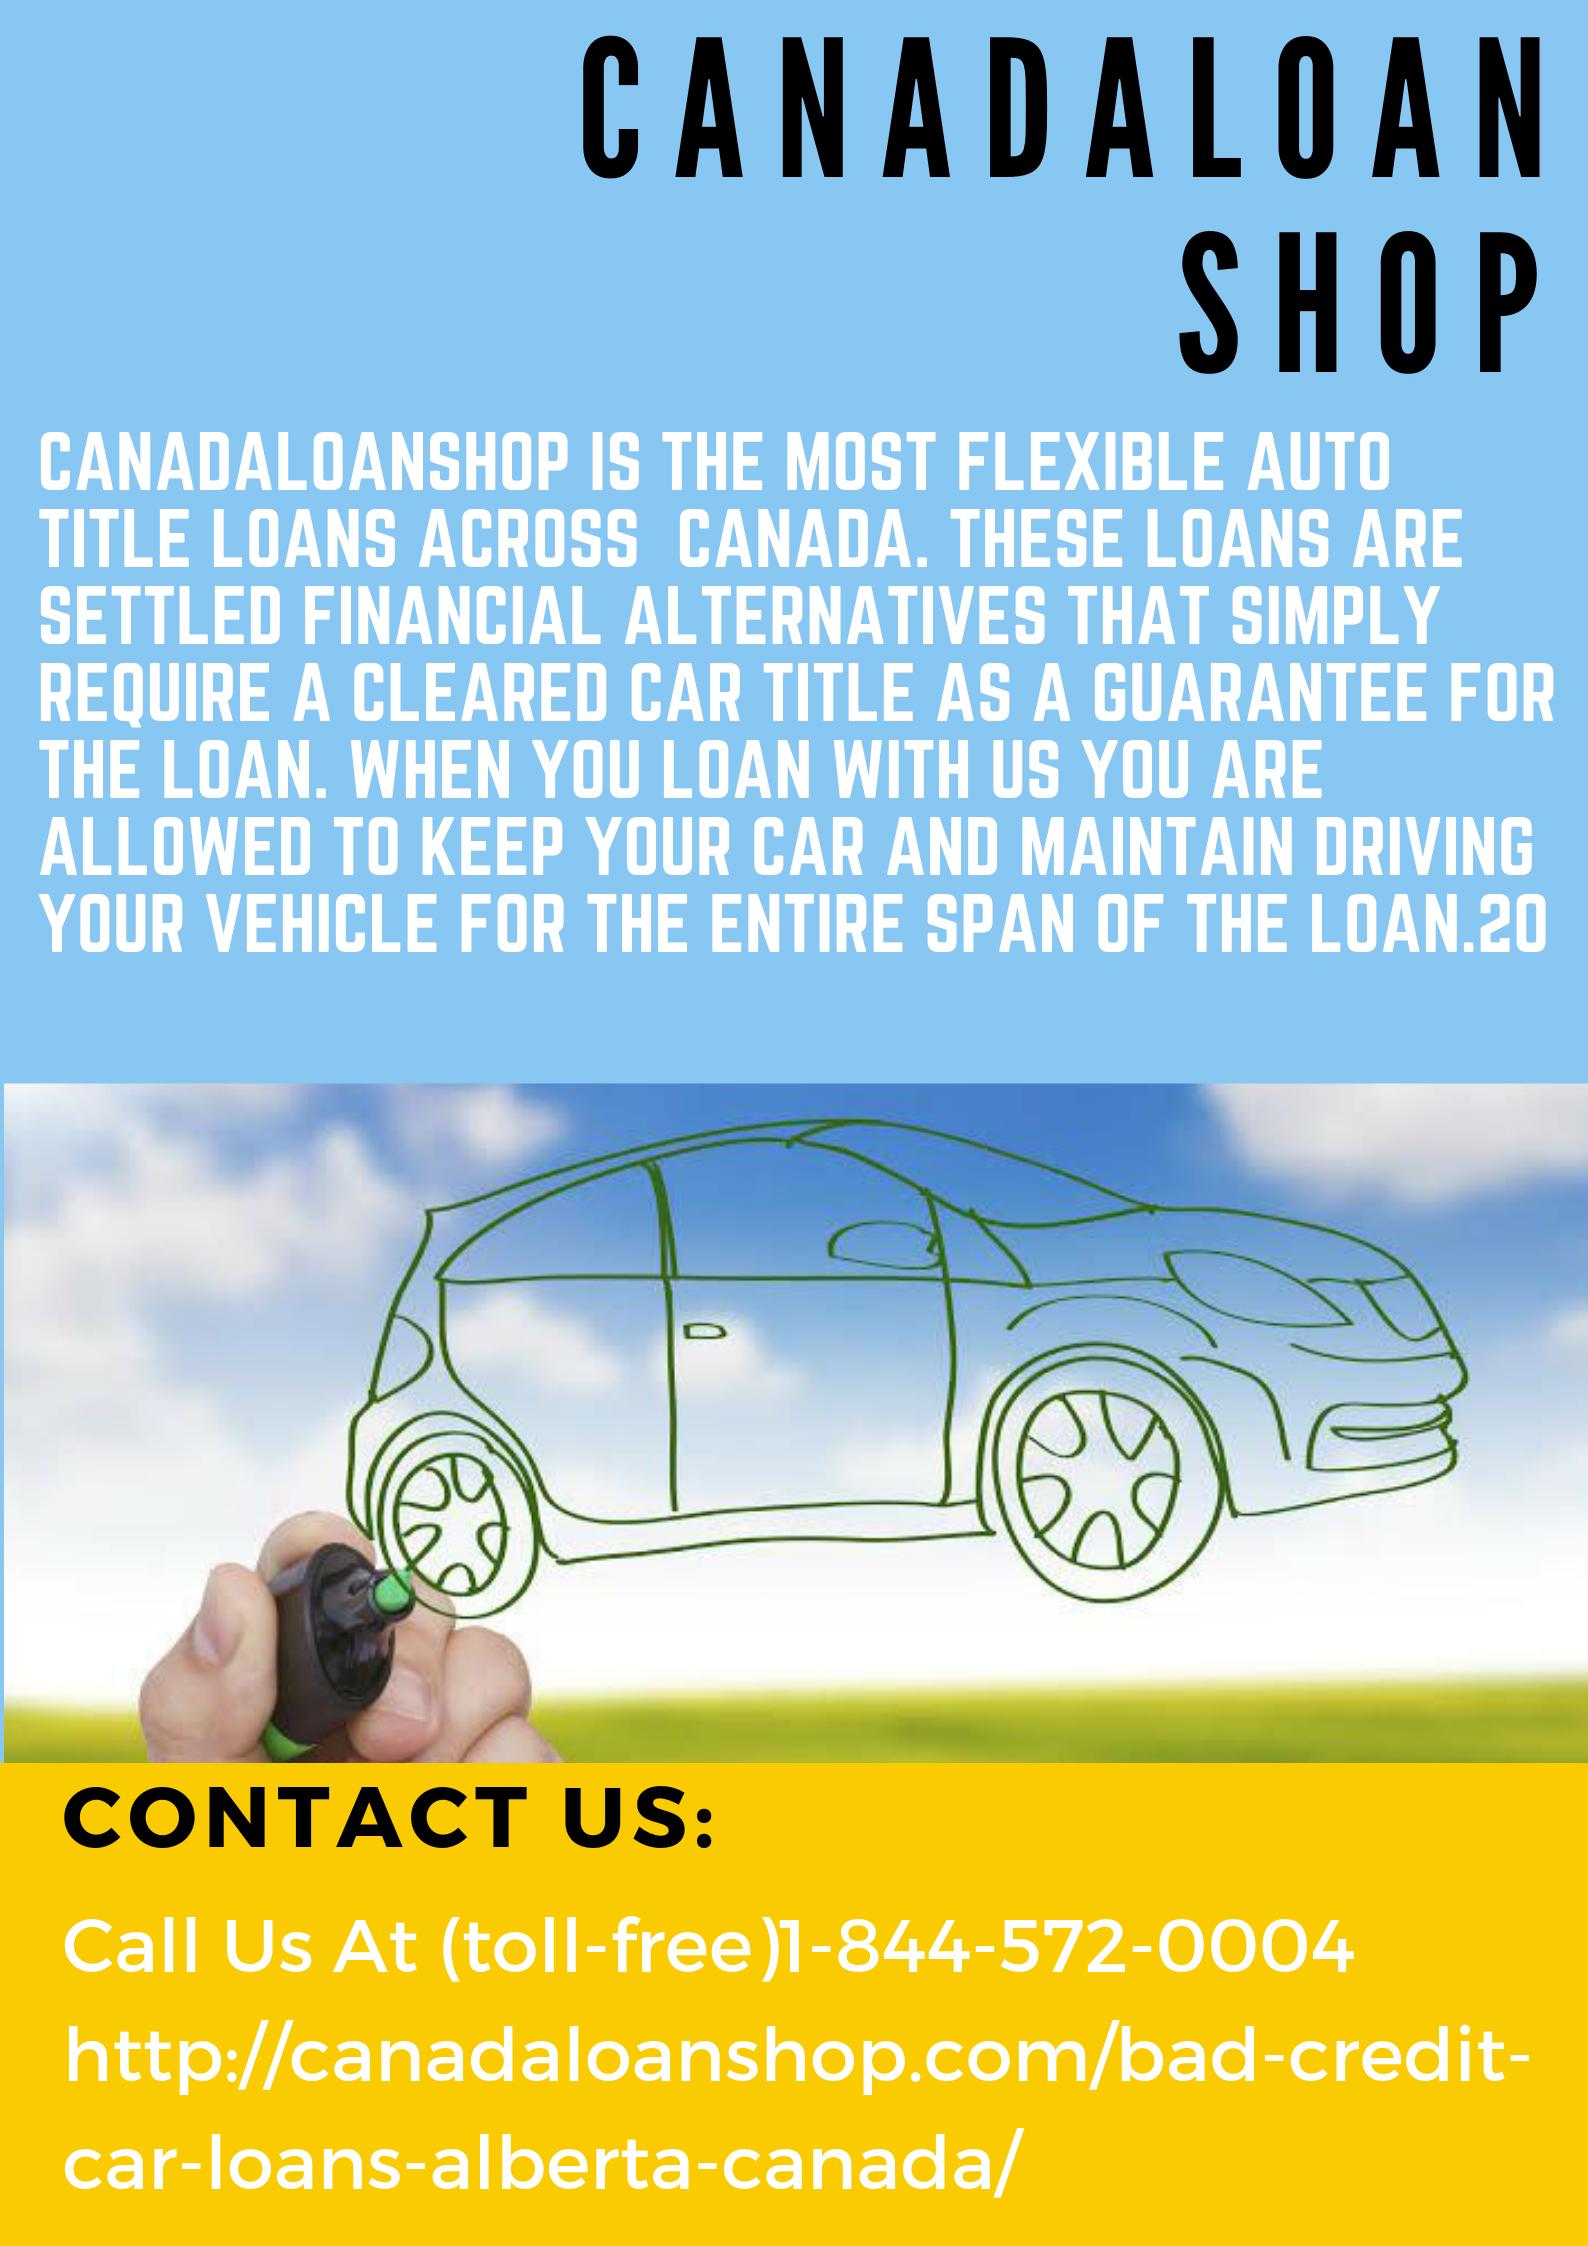 Bad Credit Car Loans Alberta Canada Car loans, Loans for